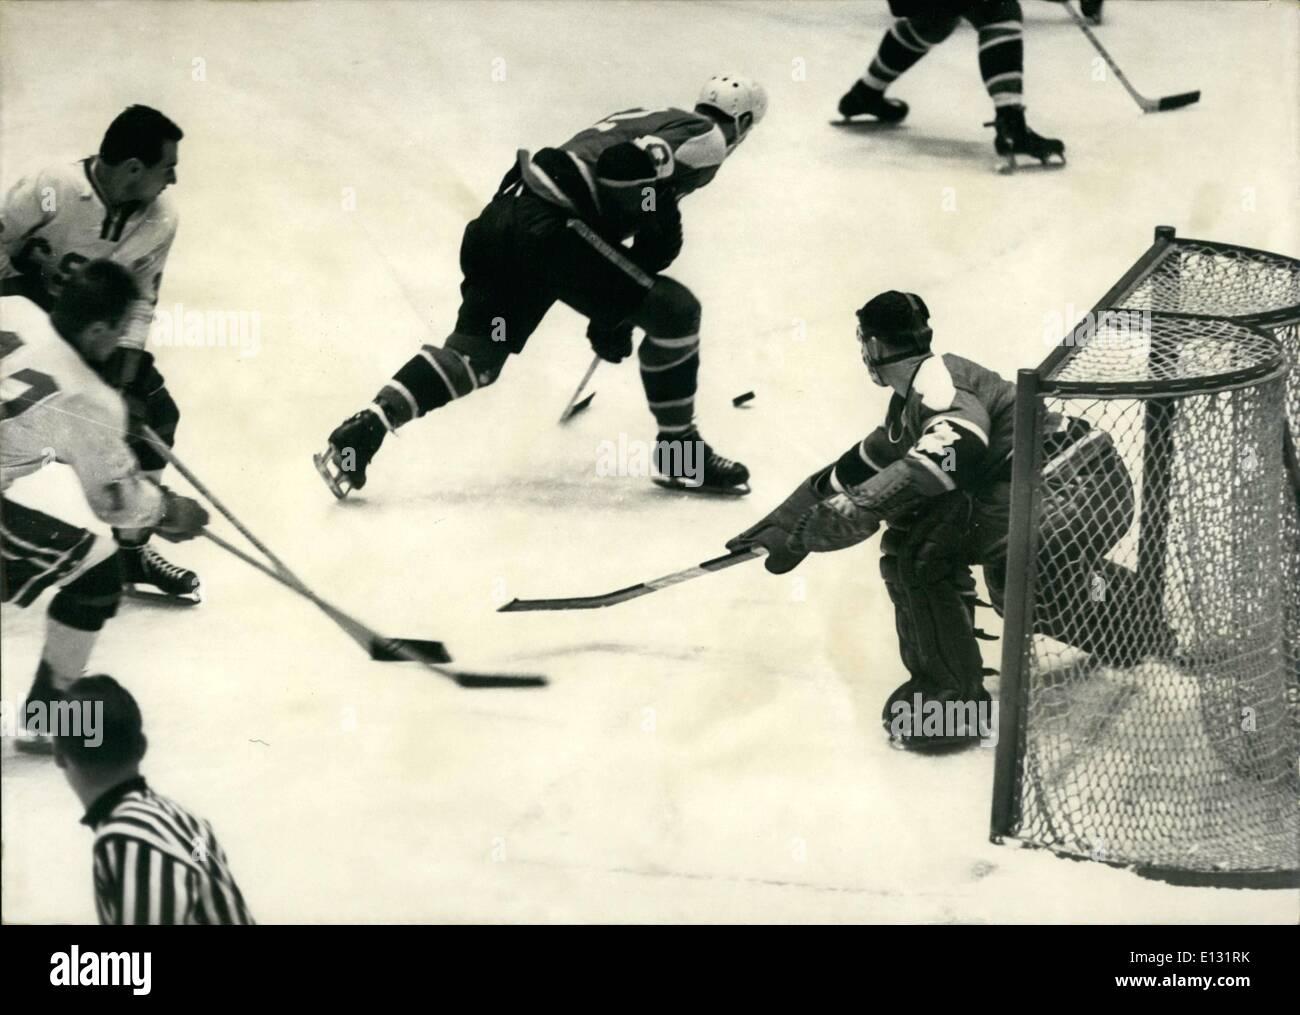 Febbraio 26, 2012 - Canada - CSSR. Hockey su ghiaccio - Match Giochi Olimpici 1964 a Innsbruck/Austria Immagini Stock